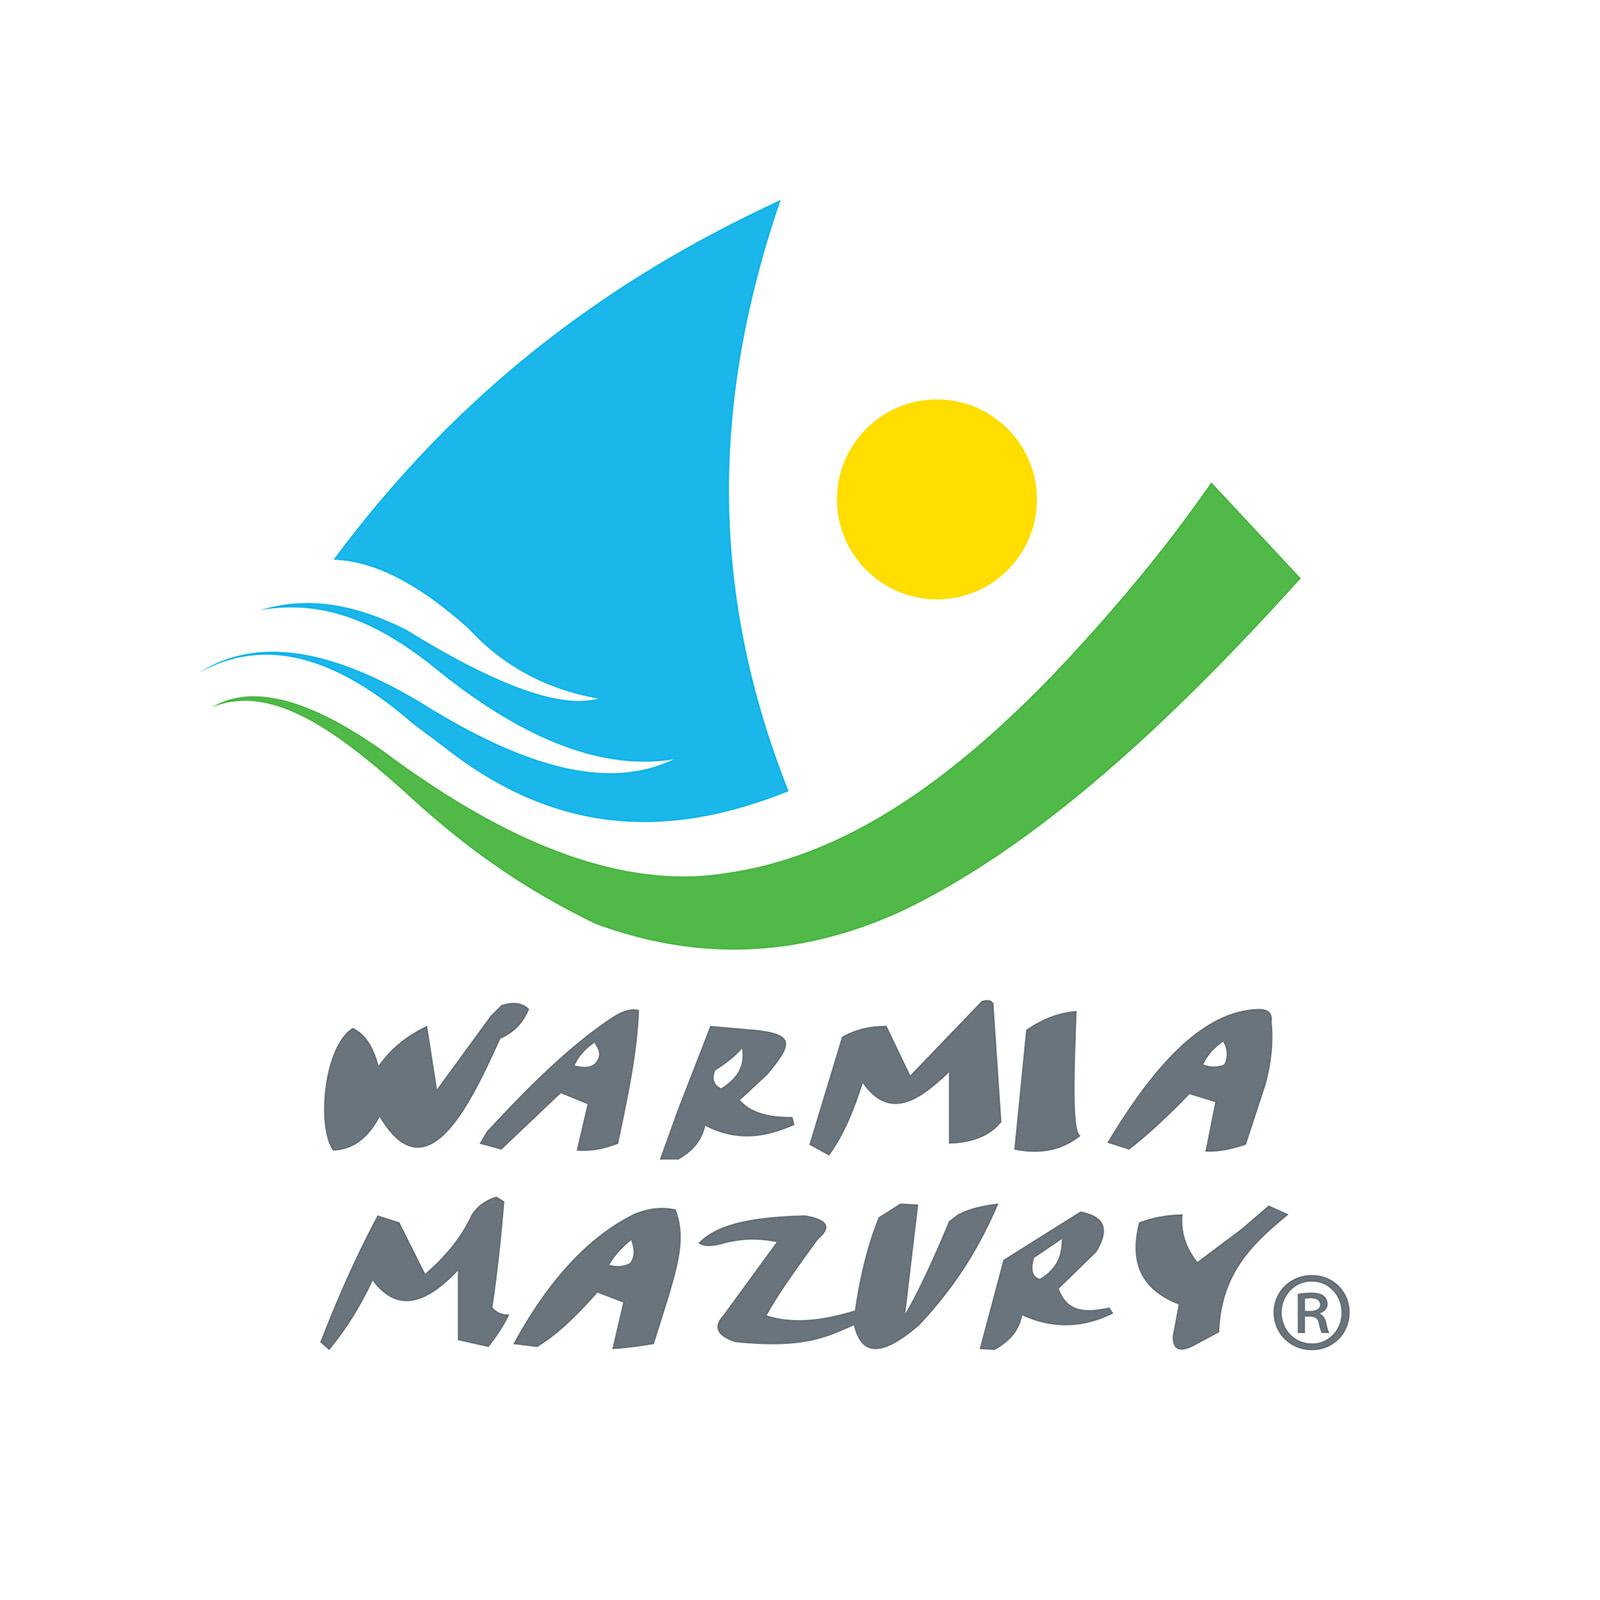 https://m.wmwm.pl/2020/10/orig/warmia-mazury-logo-6825.jpg